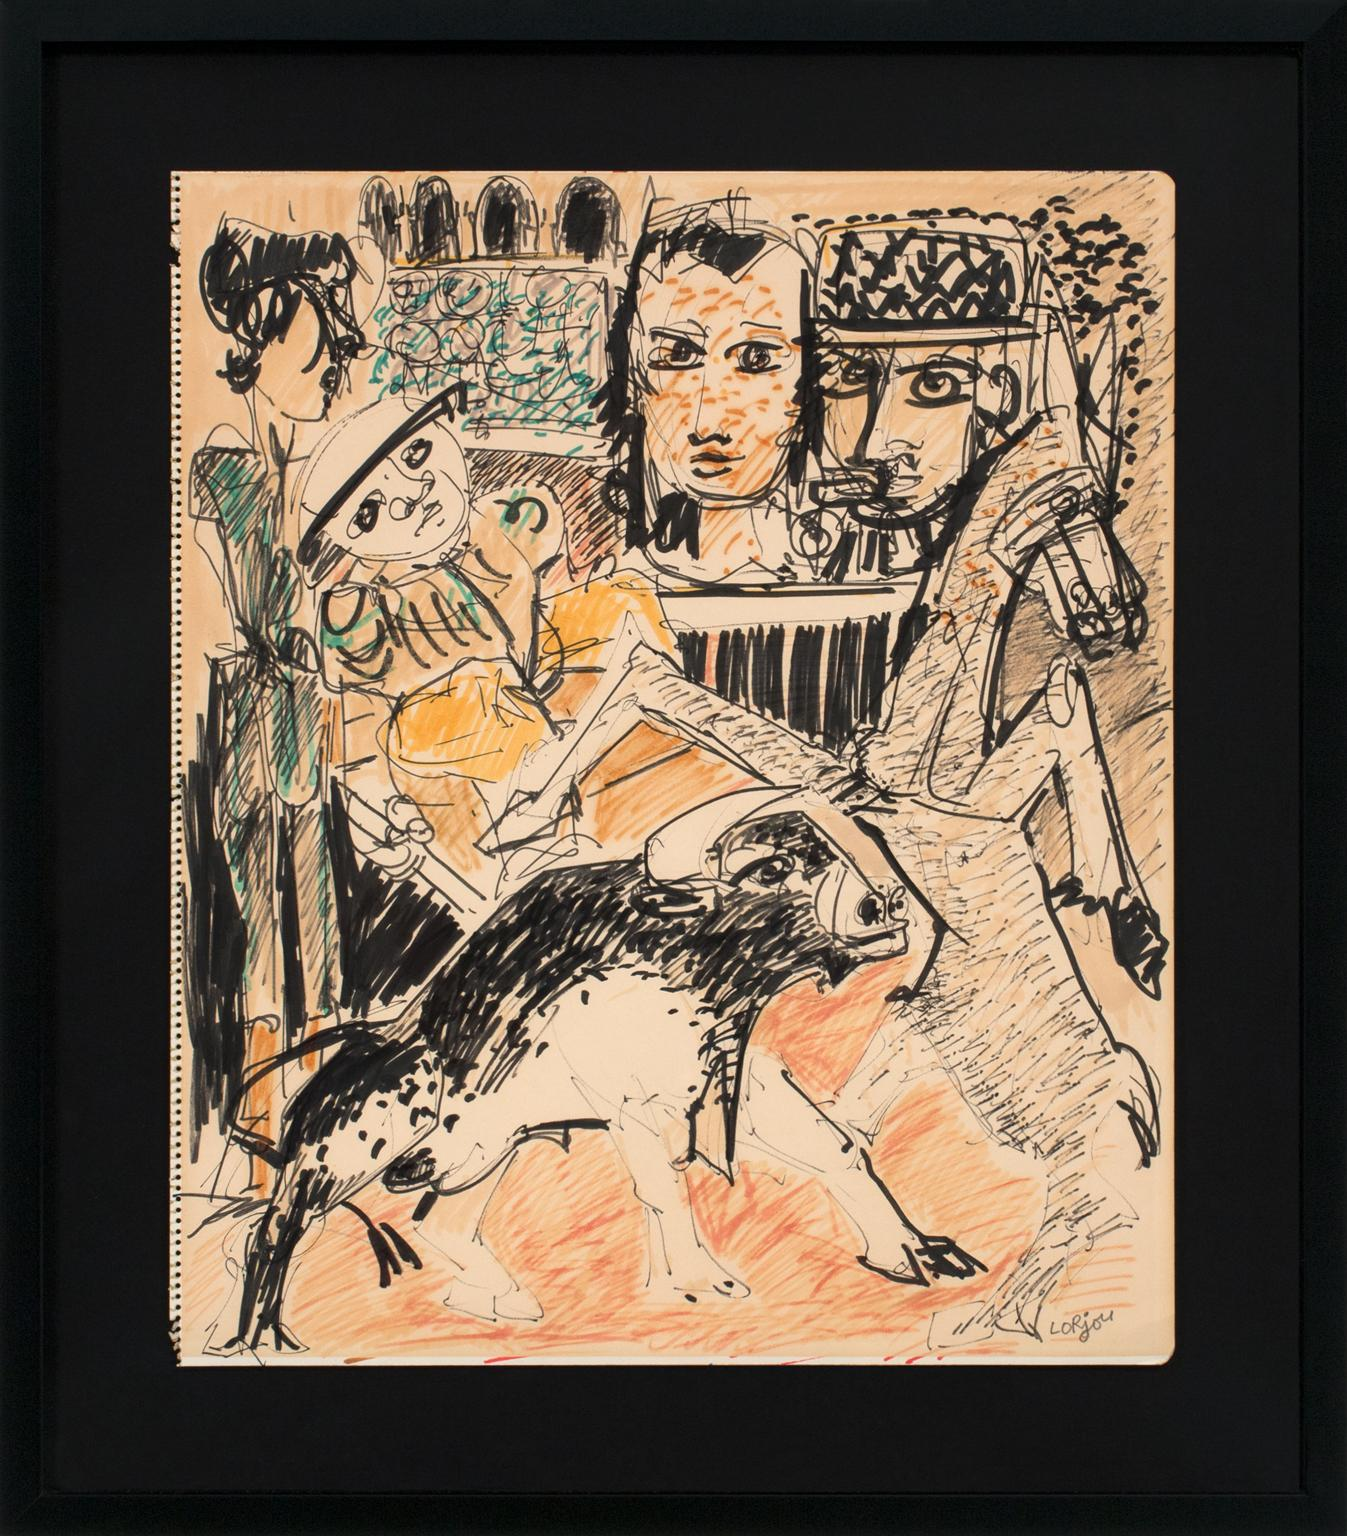 """La Corrida"" Original Mixed Media Drawing on Paper by Bernard Lorjou, Framed"